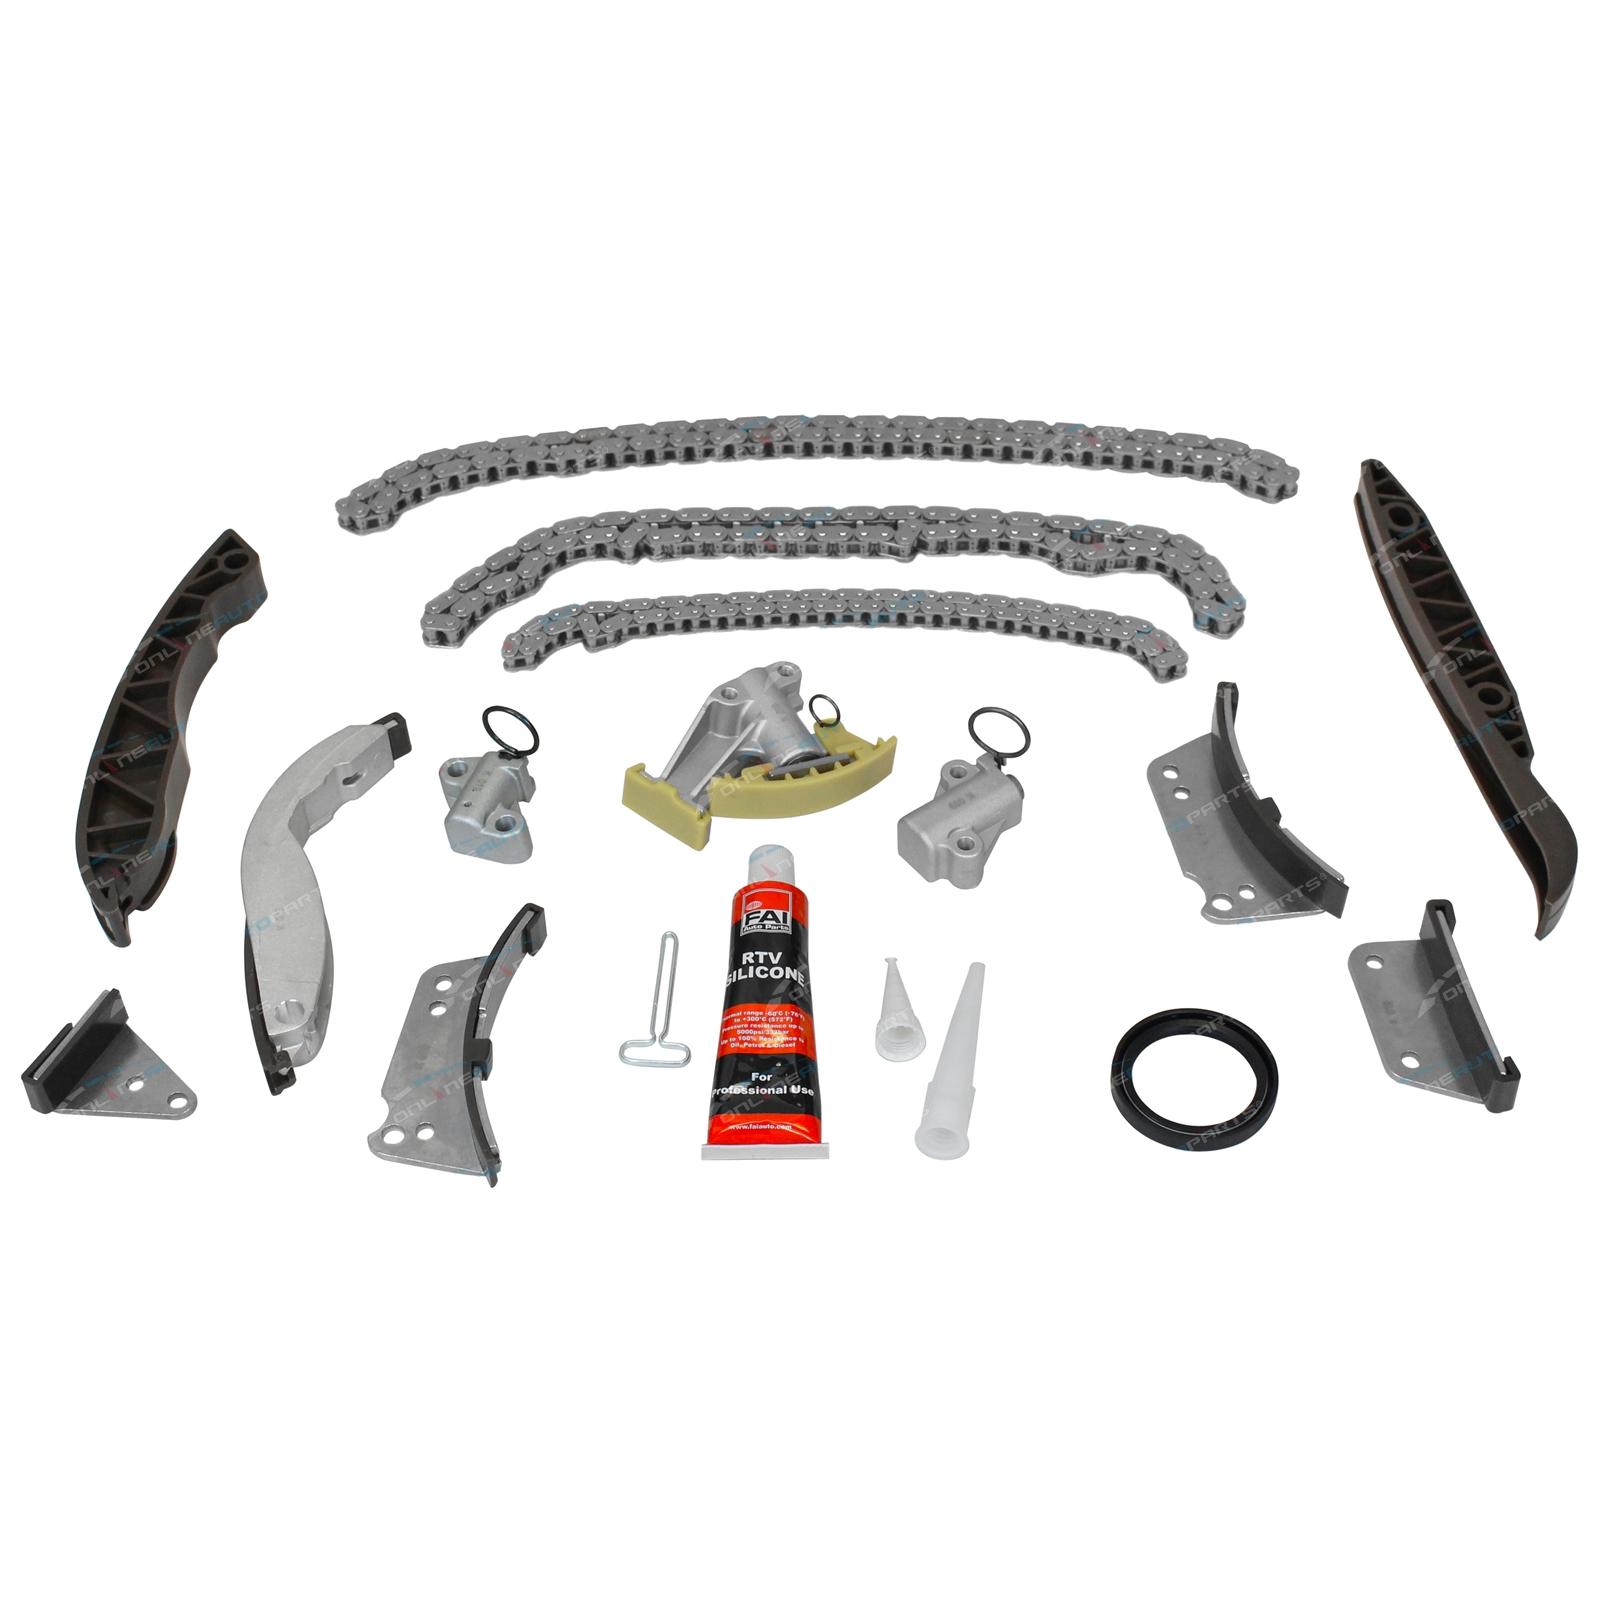 FAI Timing Chain Kit suits Hyundai iLOAD iMax TQ-V TQ-W